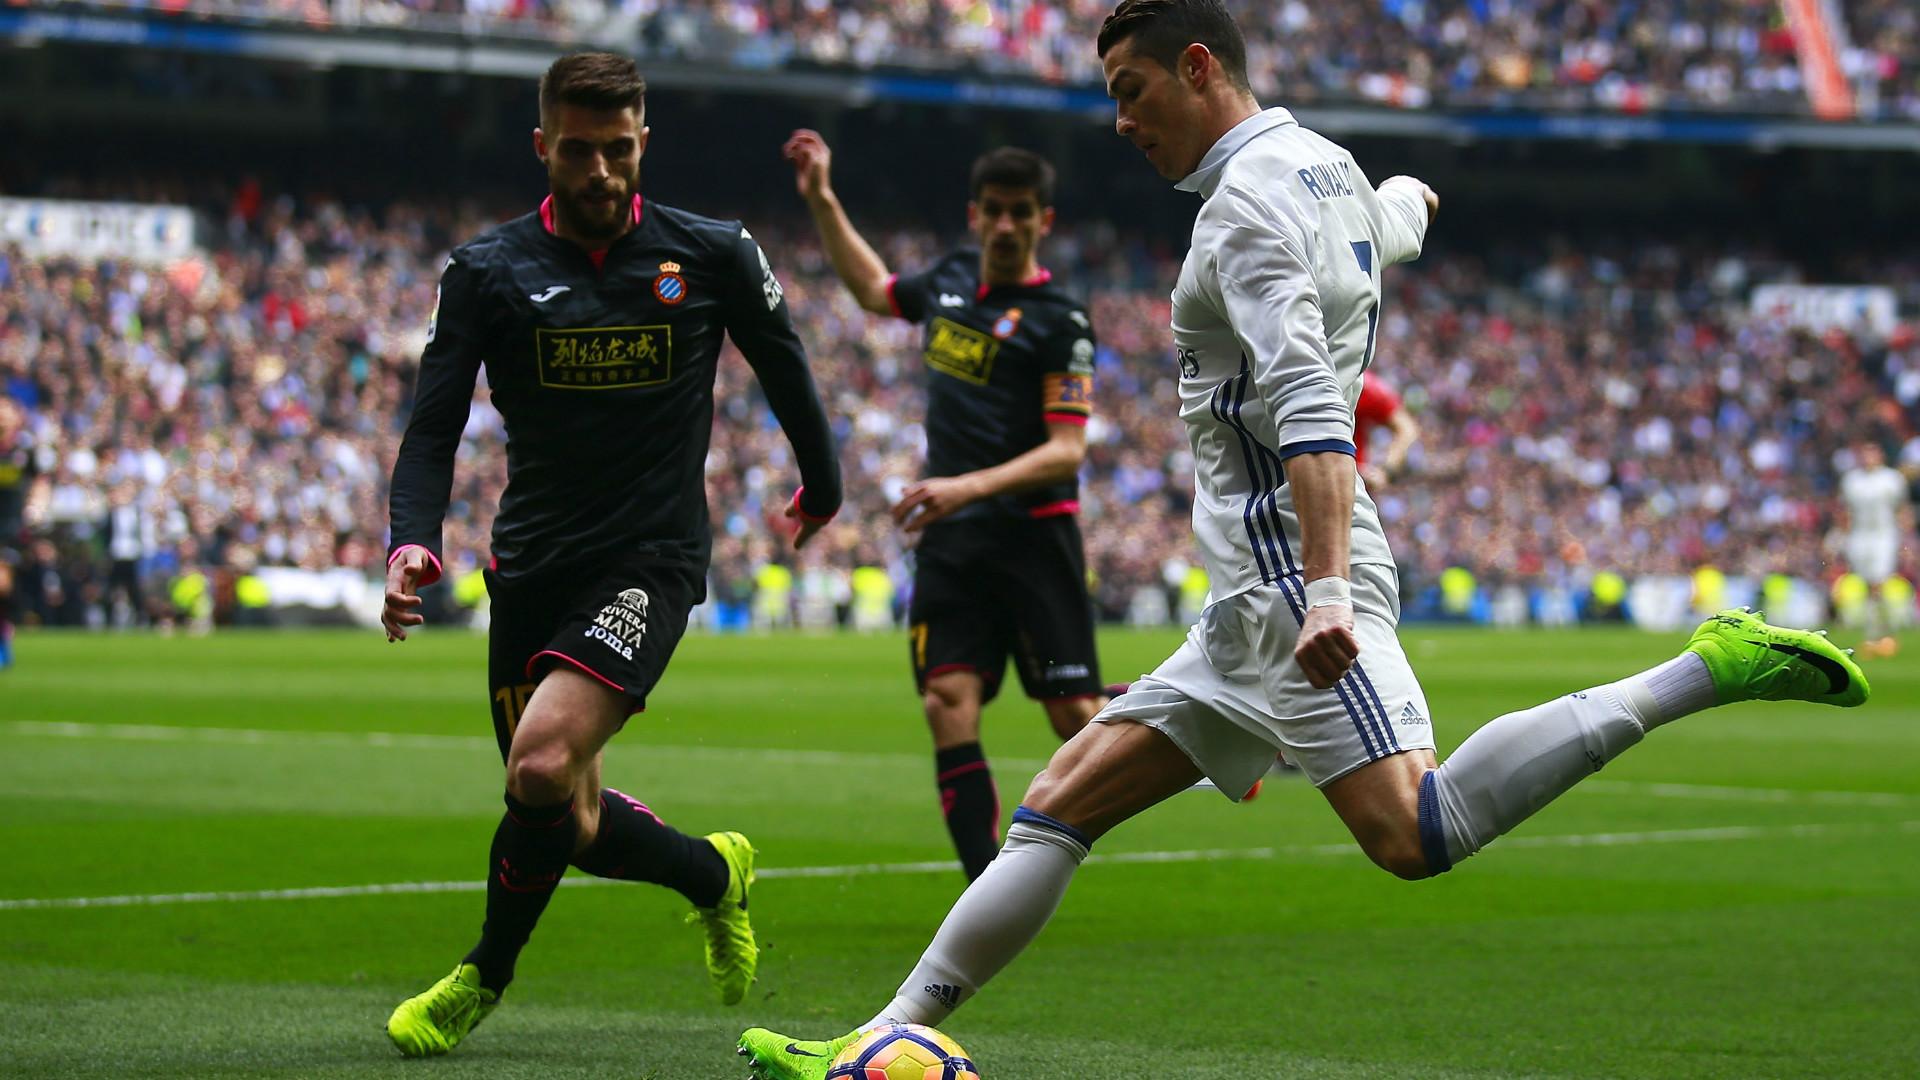 David Lopez Cristiano Ronaldo Real Madrid Espanyol LaLiga